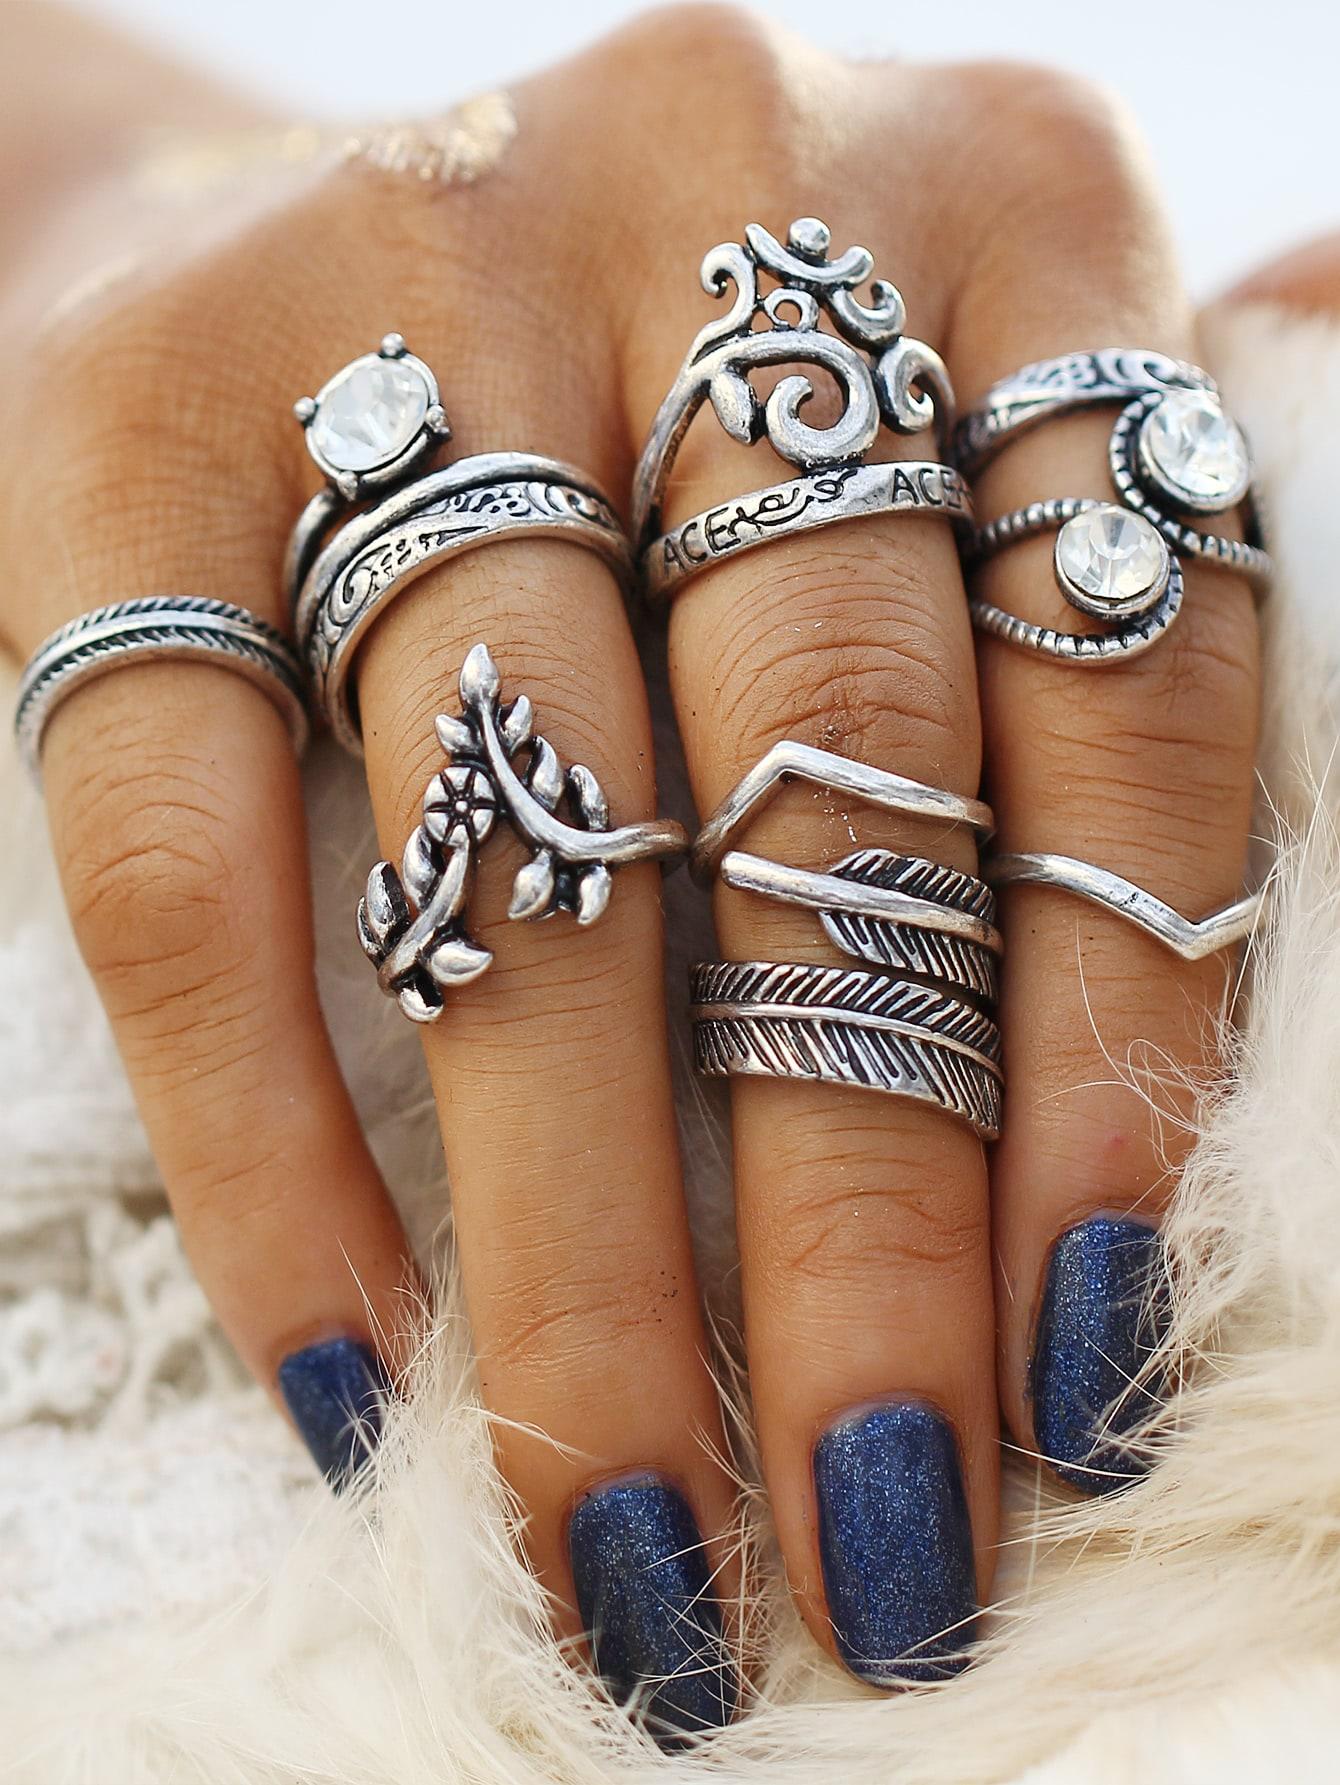 Heart & Leaf Design Ring Set 8pcs open heart design ring